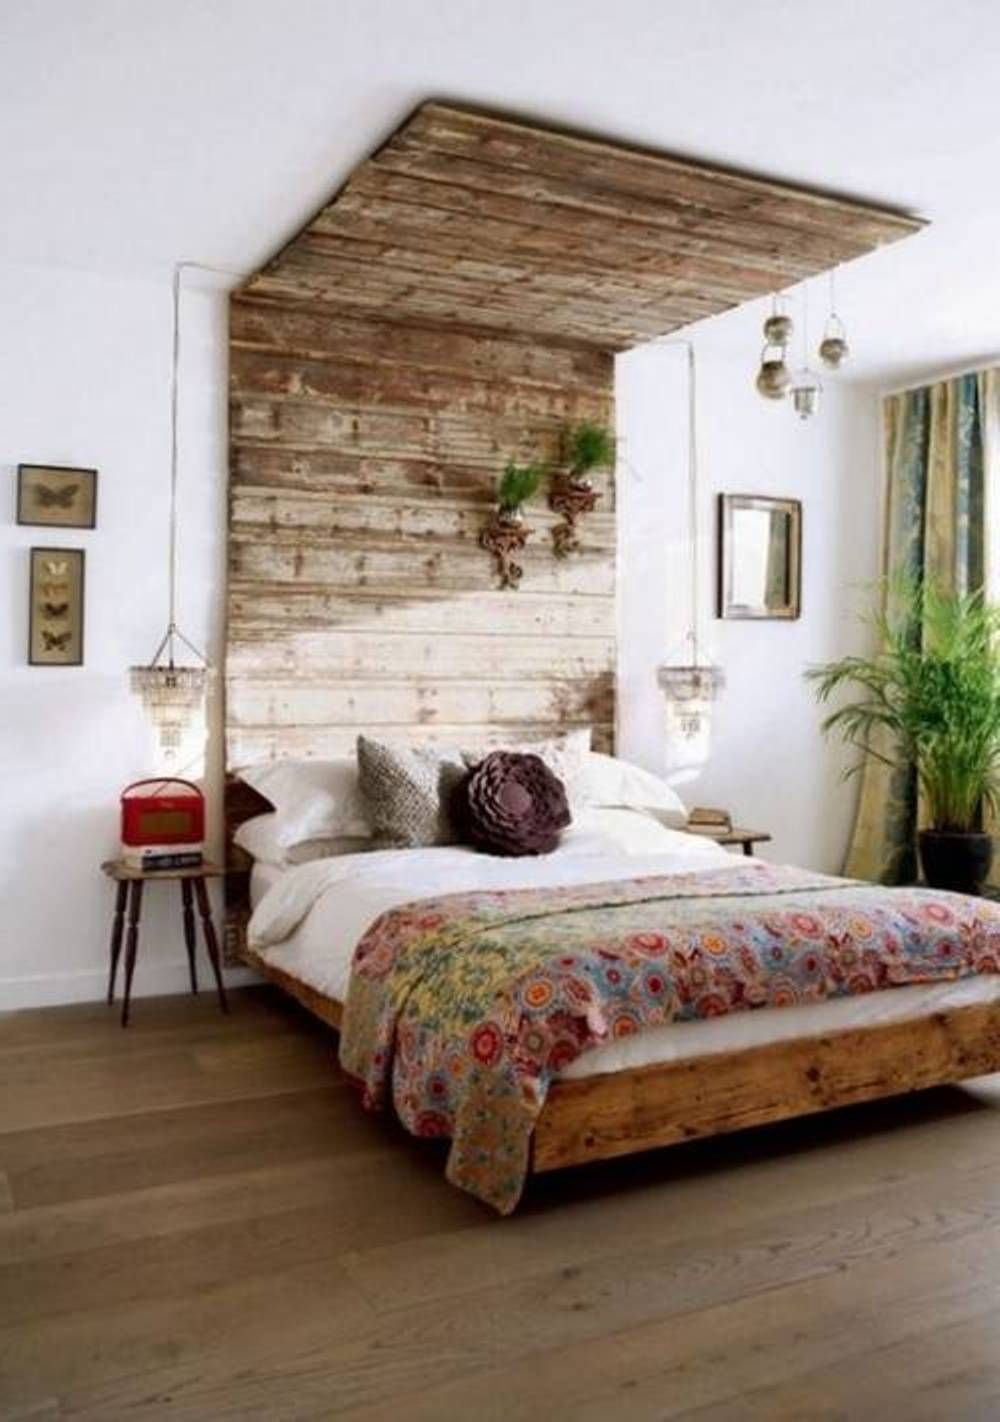 rbbi37 ideas here rustic boys bedroom ideas collection 5148